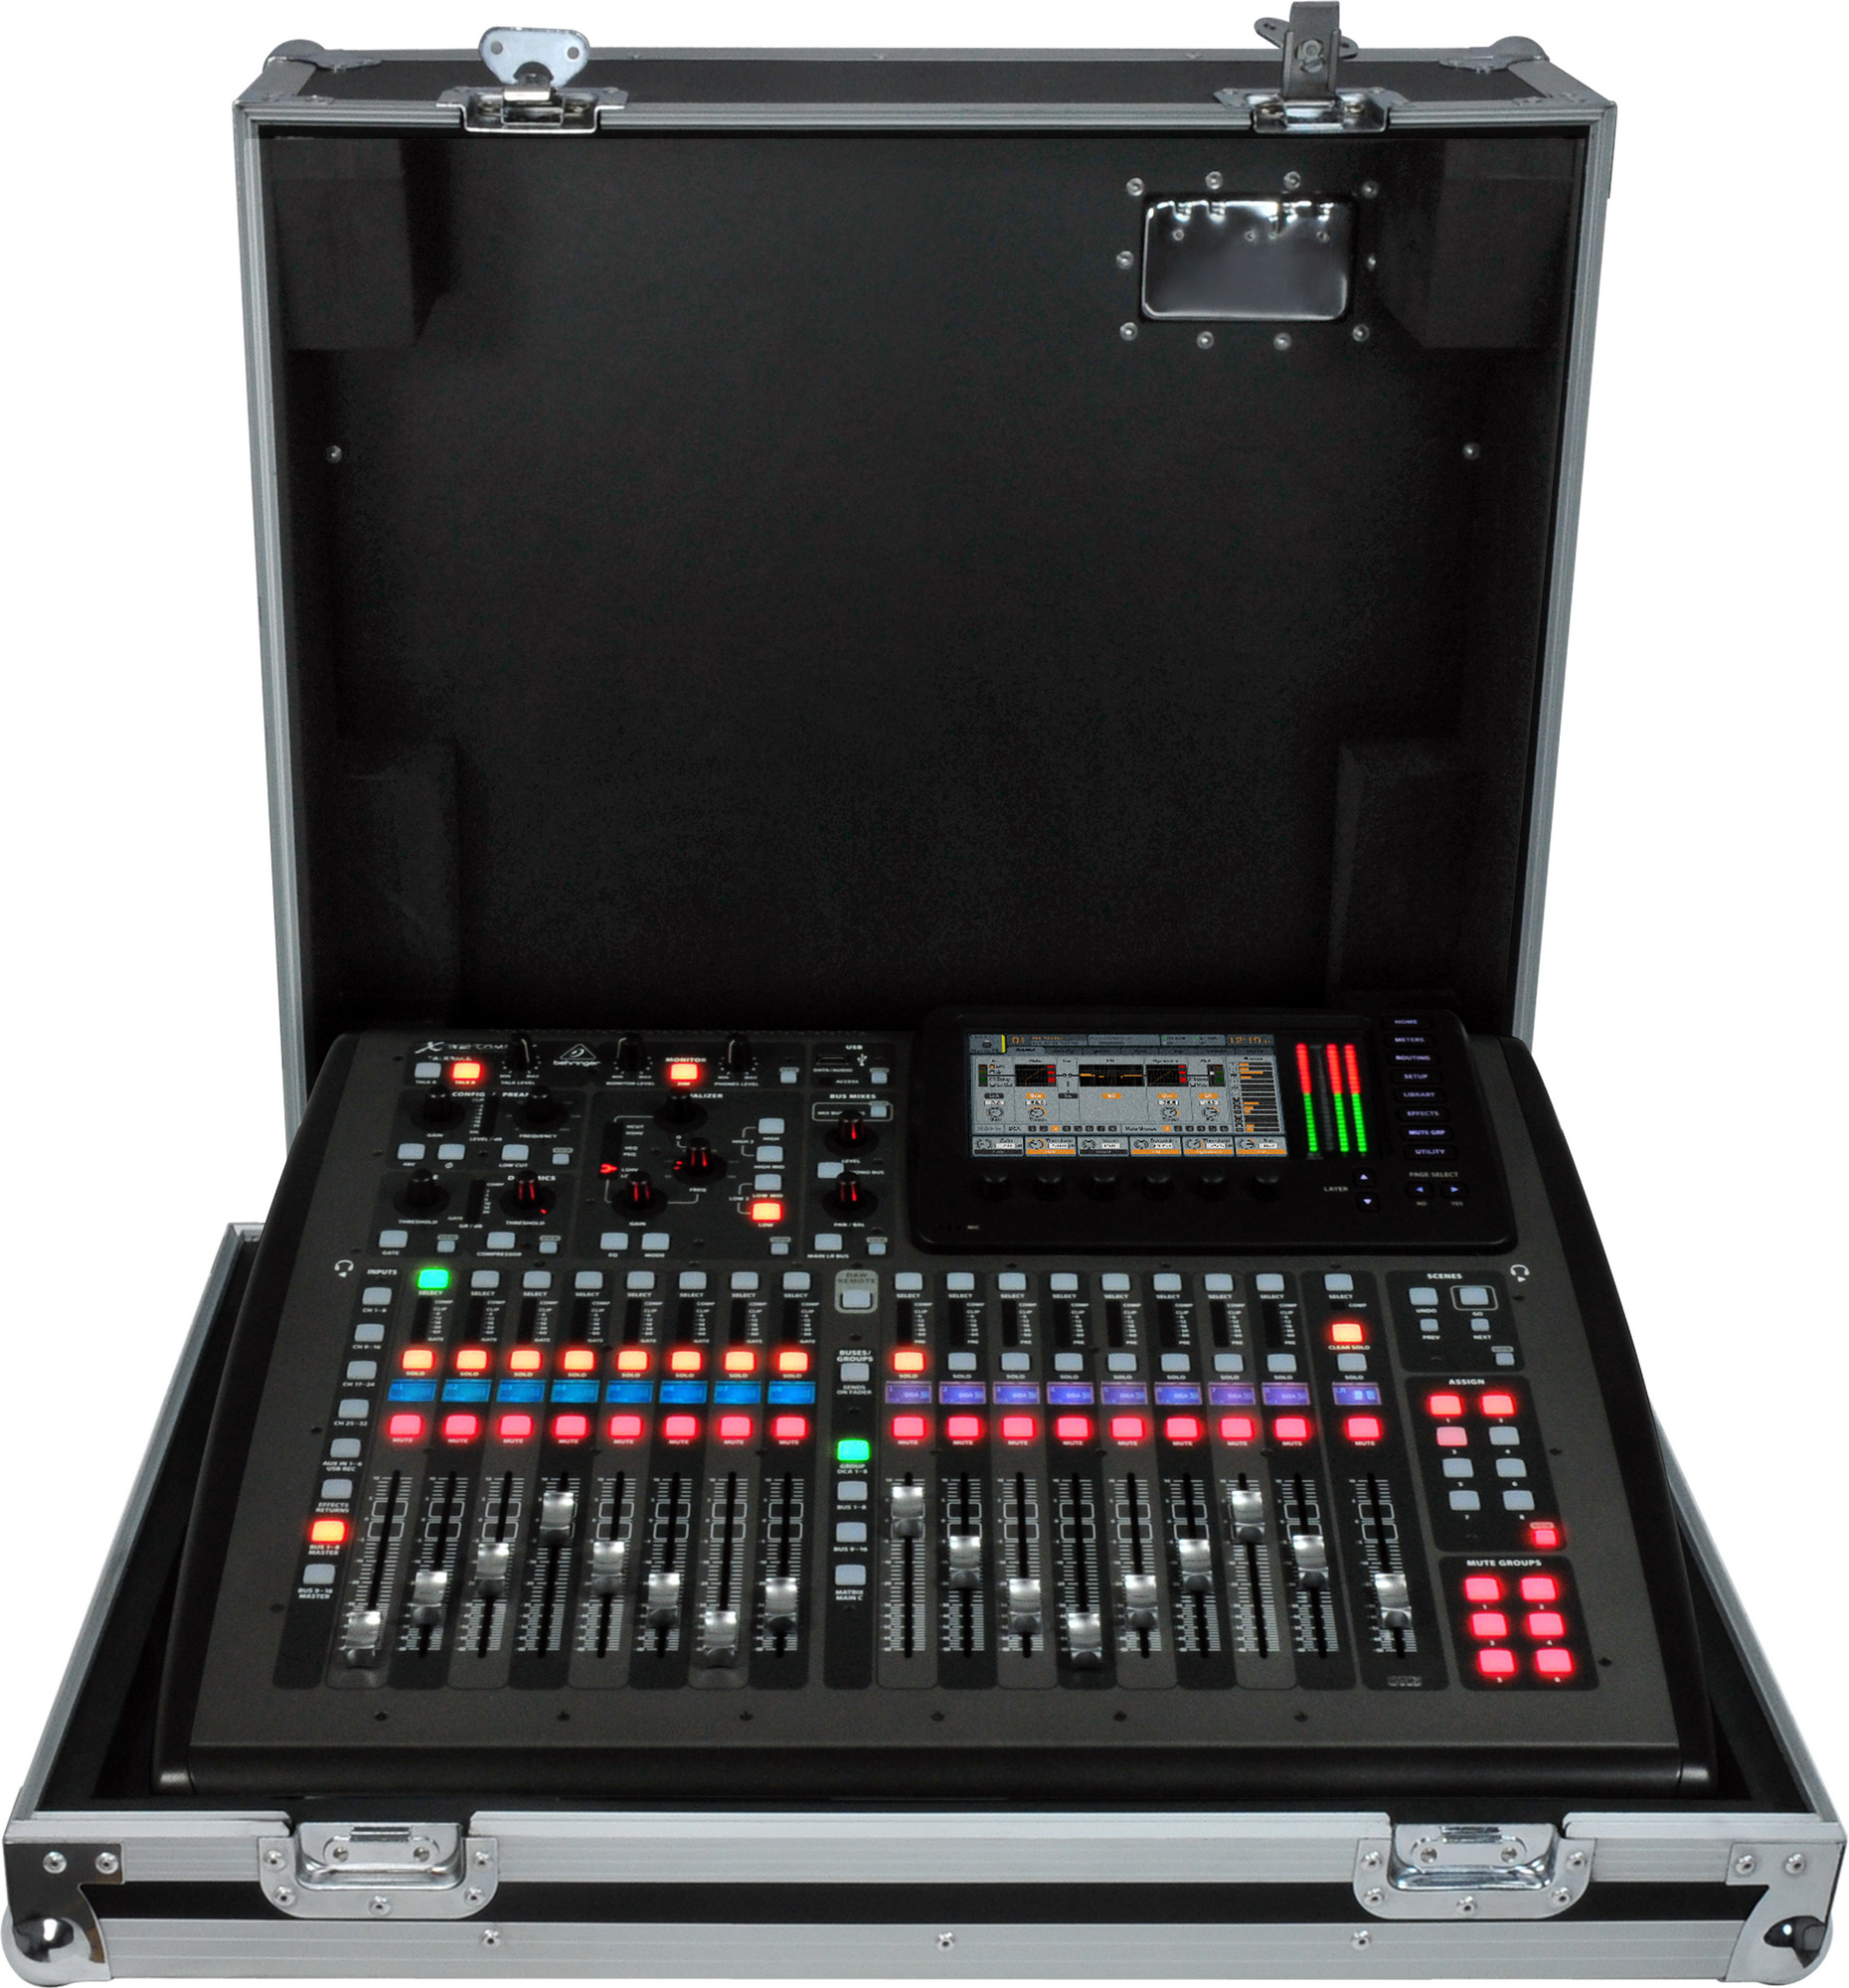 behringer x32 compact tp 40 input digital mixer touring package includes case. Black Bedroom Furniture Sets. Home Design Ideas